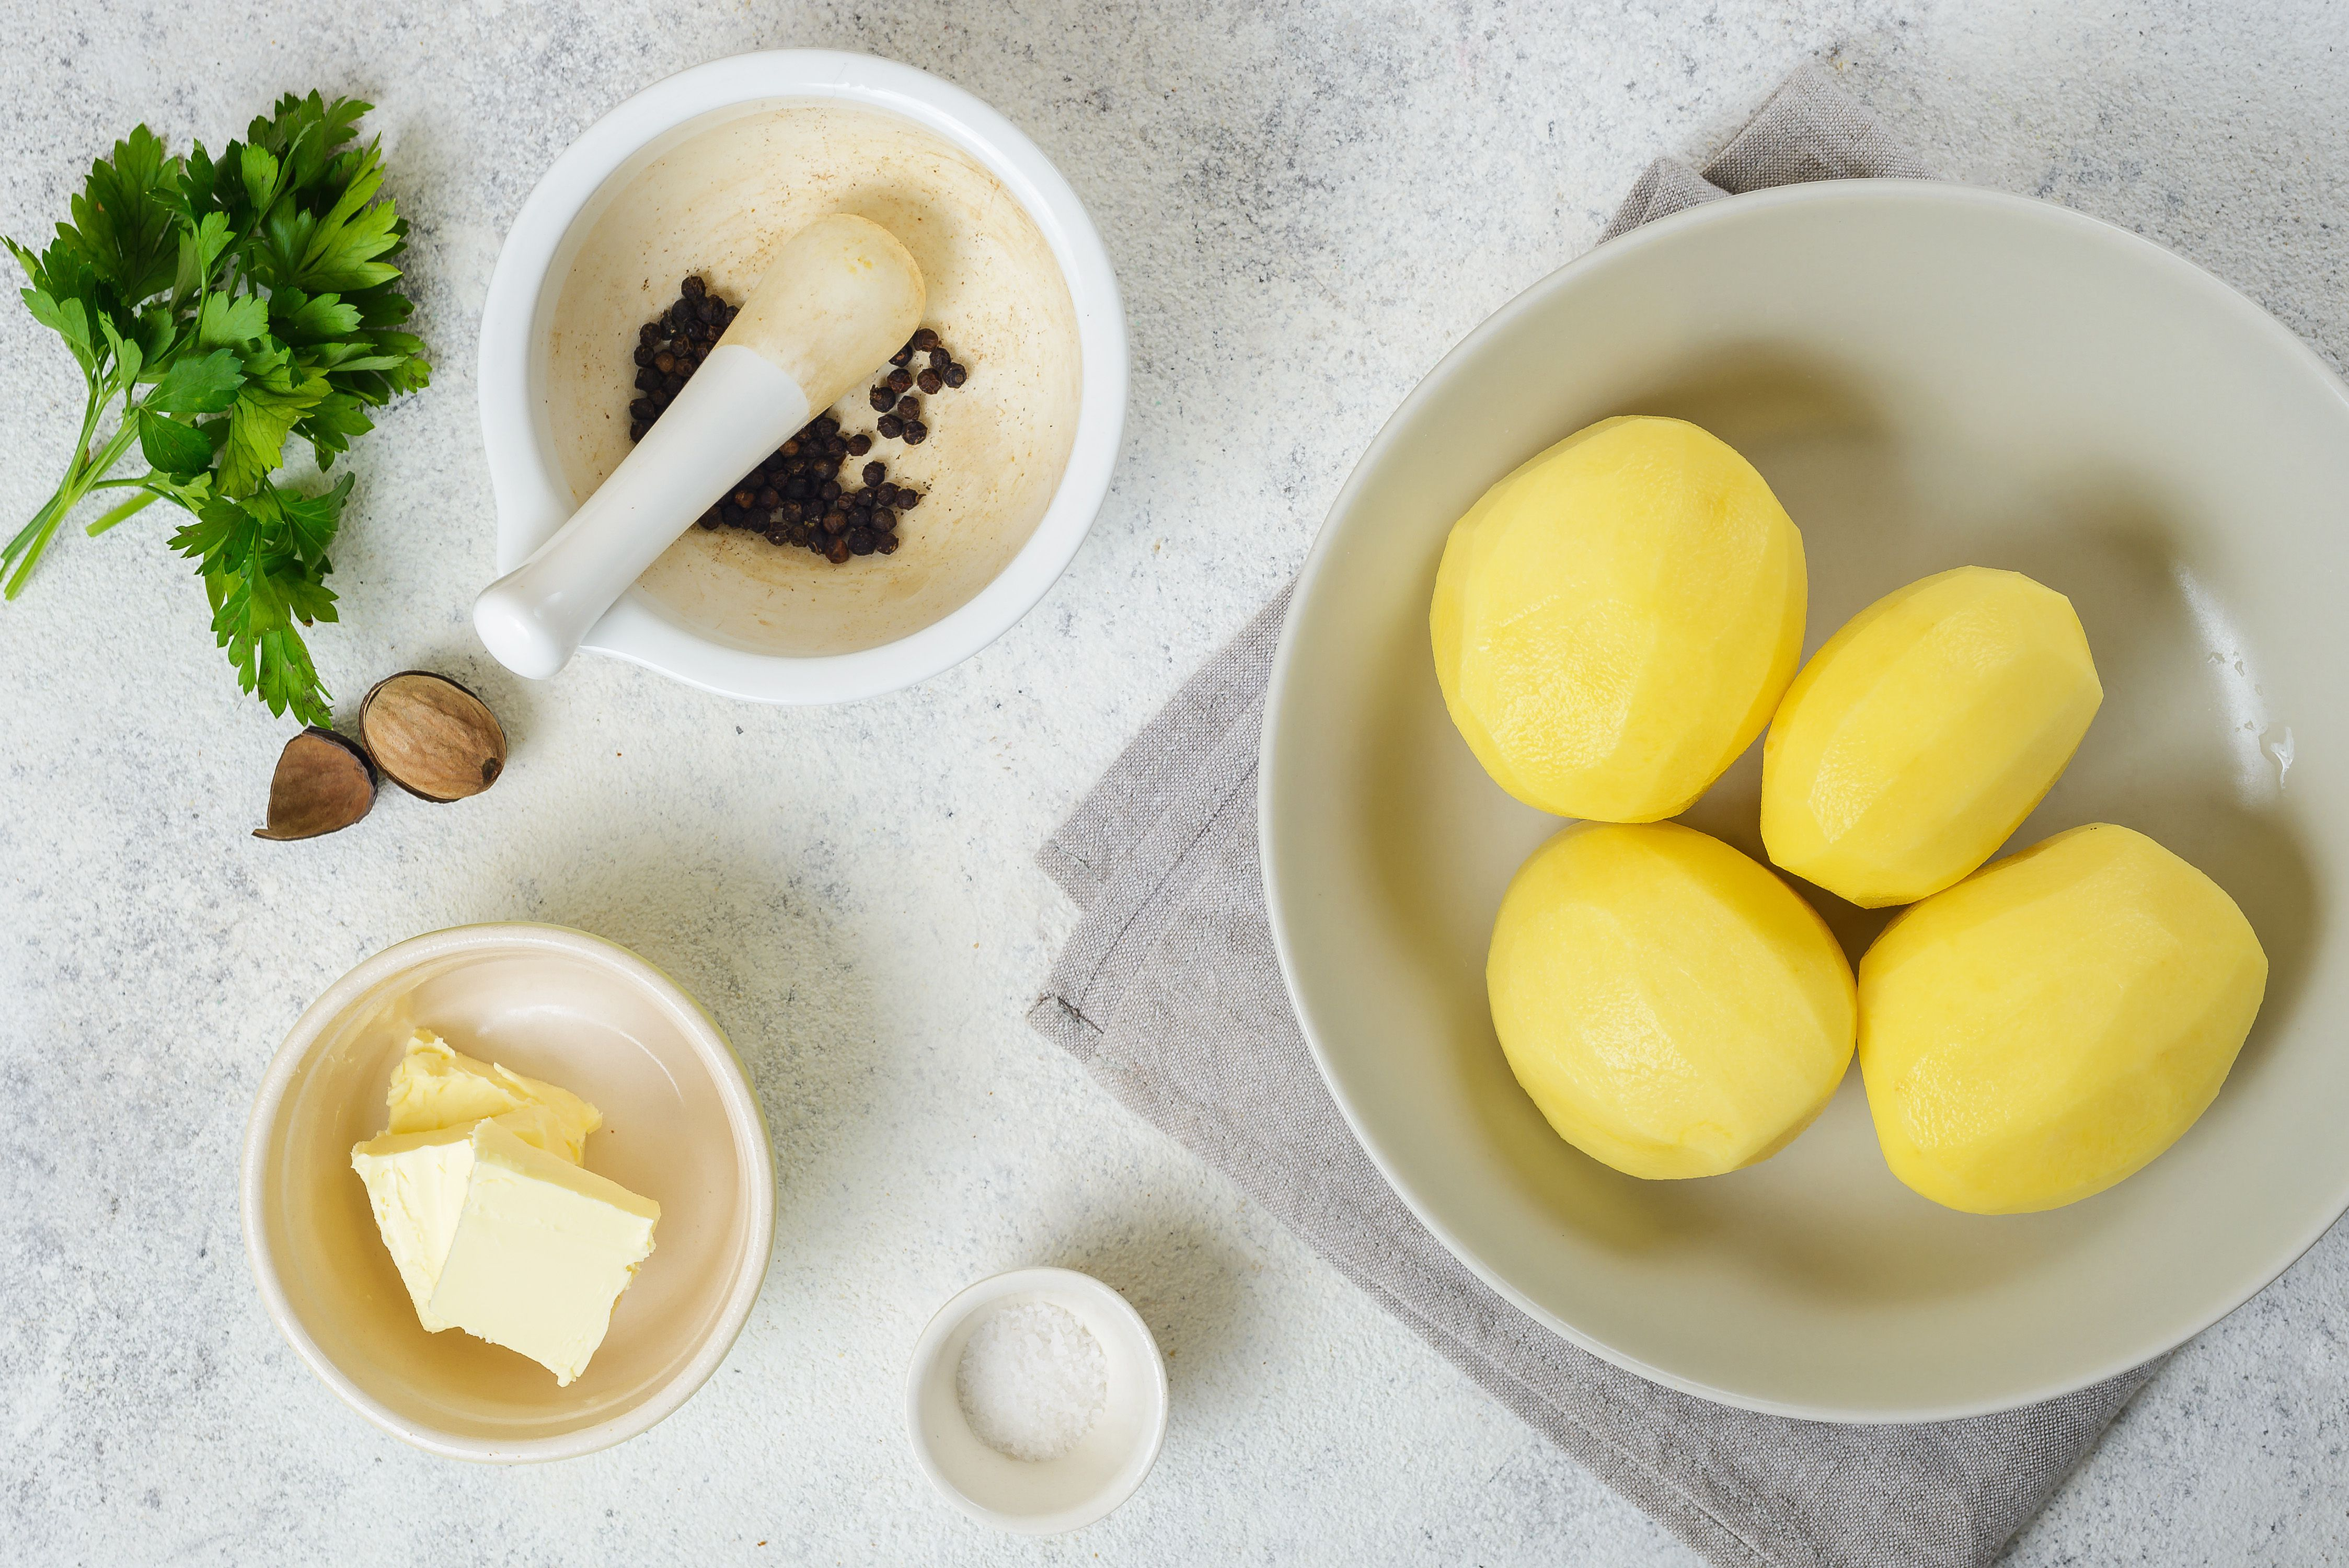 Potatoes, butter, nutmeg